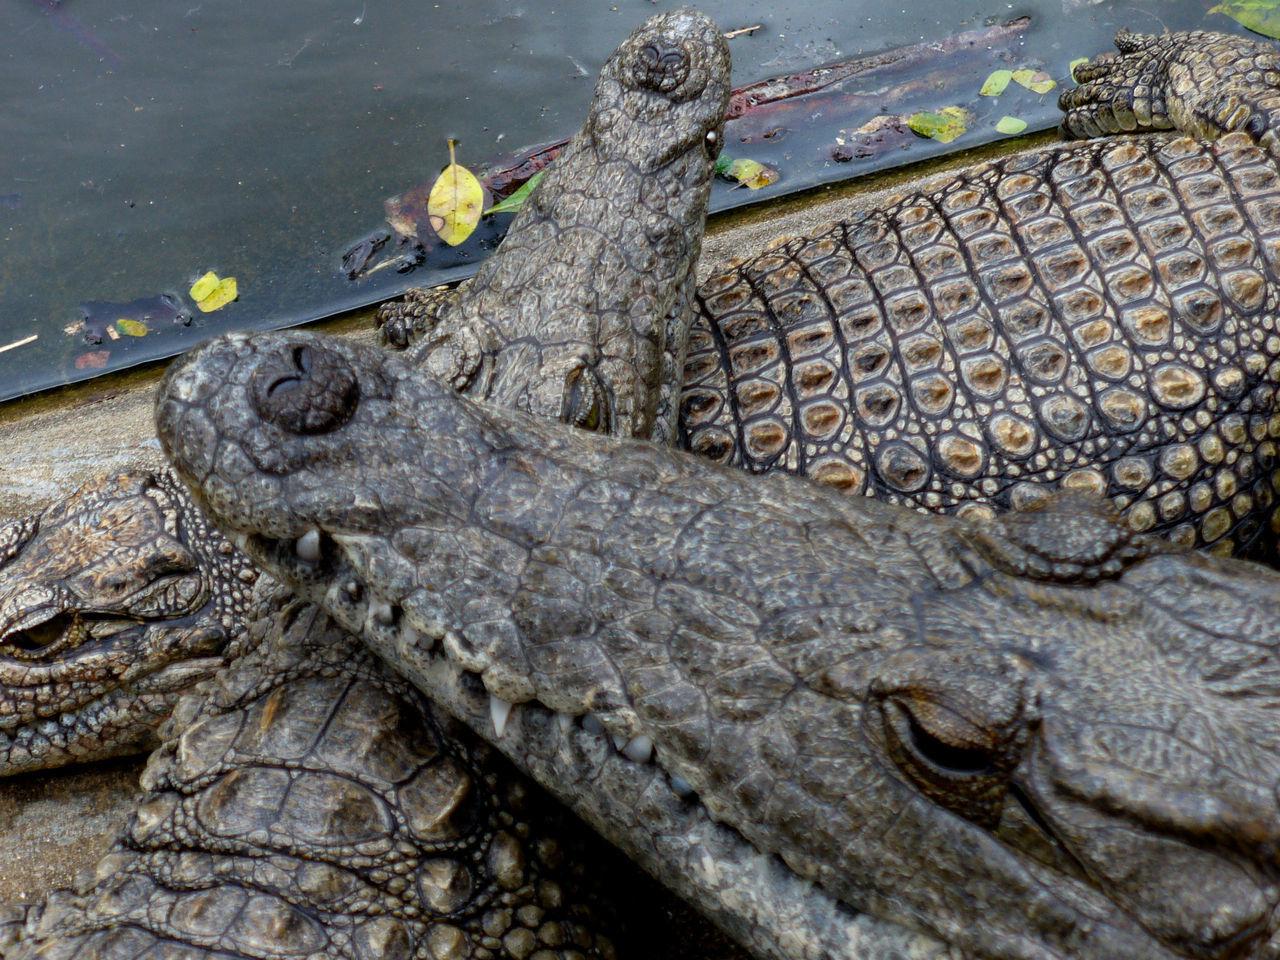 reptile, animals in the wild, animal wildlife, animal themes, alligator, outdoors, one animal, crocodile, animal head, day, no people, close-up, animal scale, nature, water, iguana